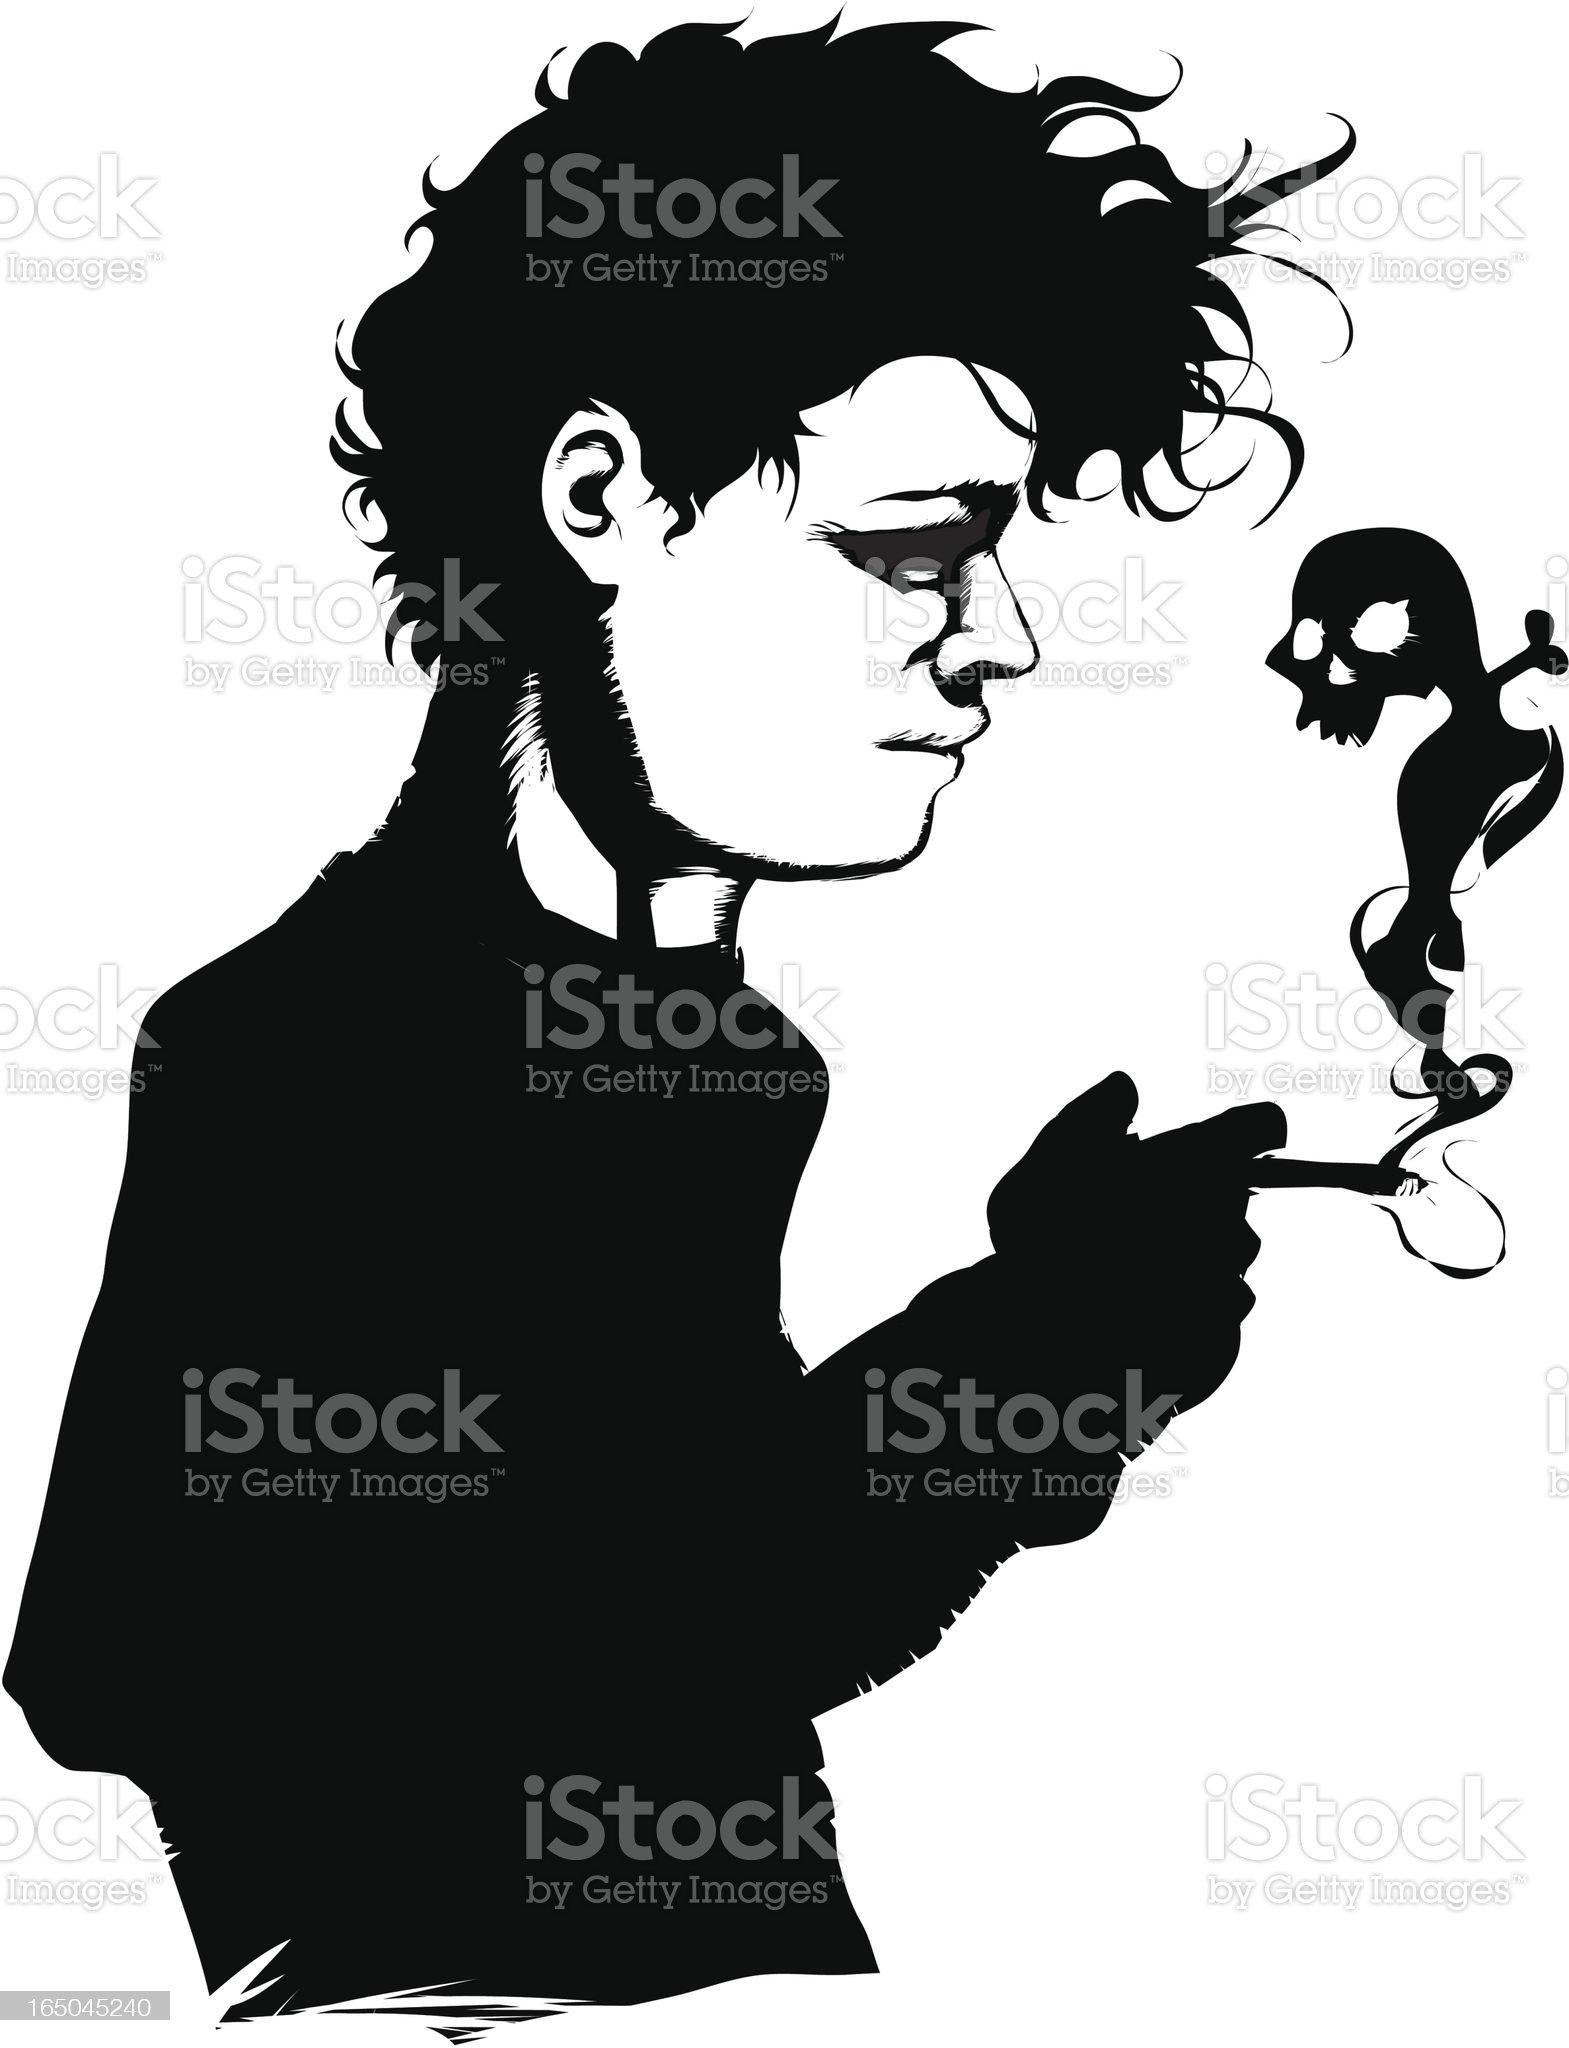 Smoke skull royalty-free stock vector art